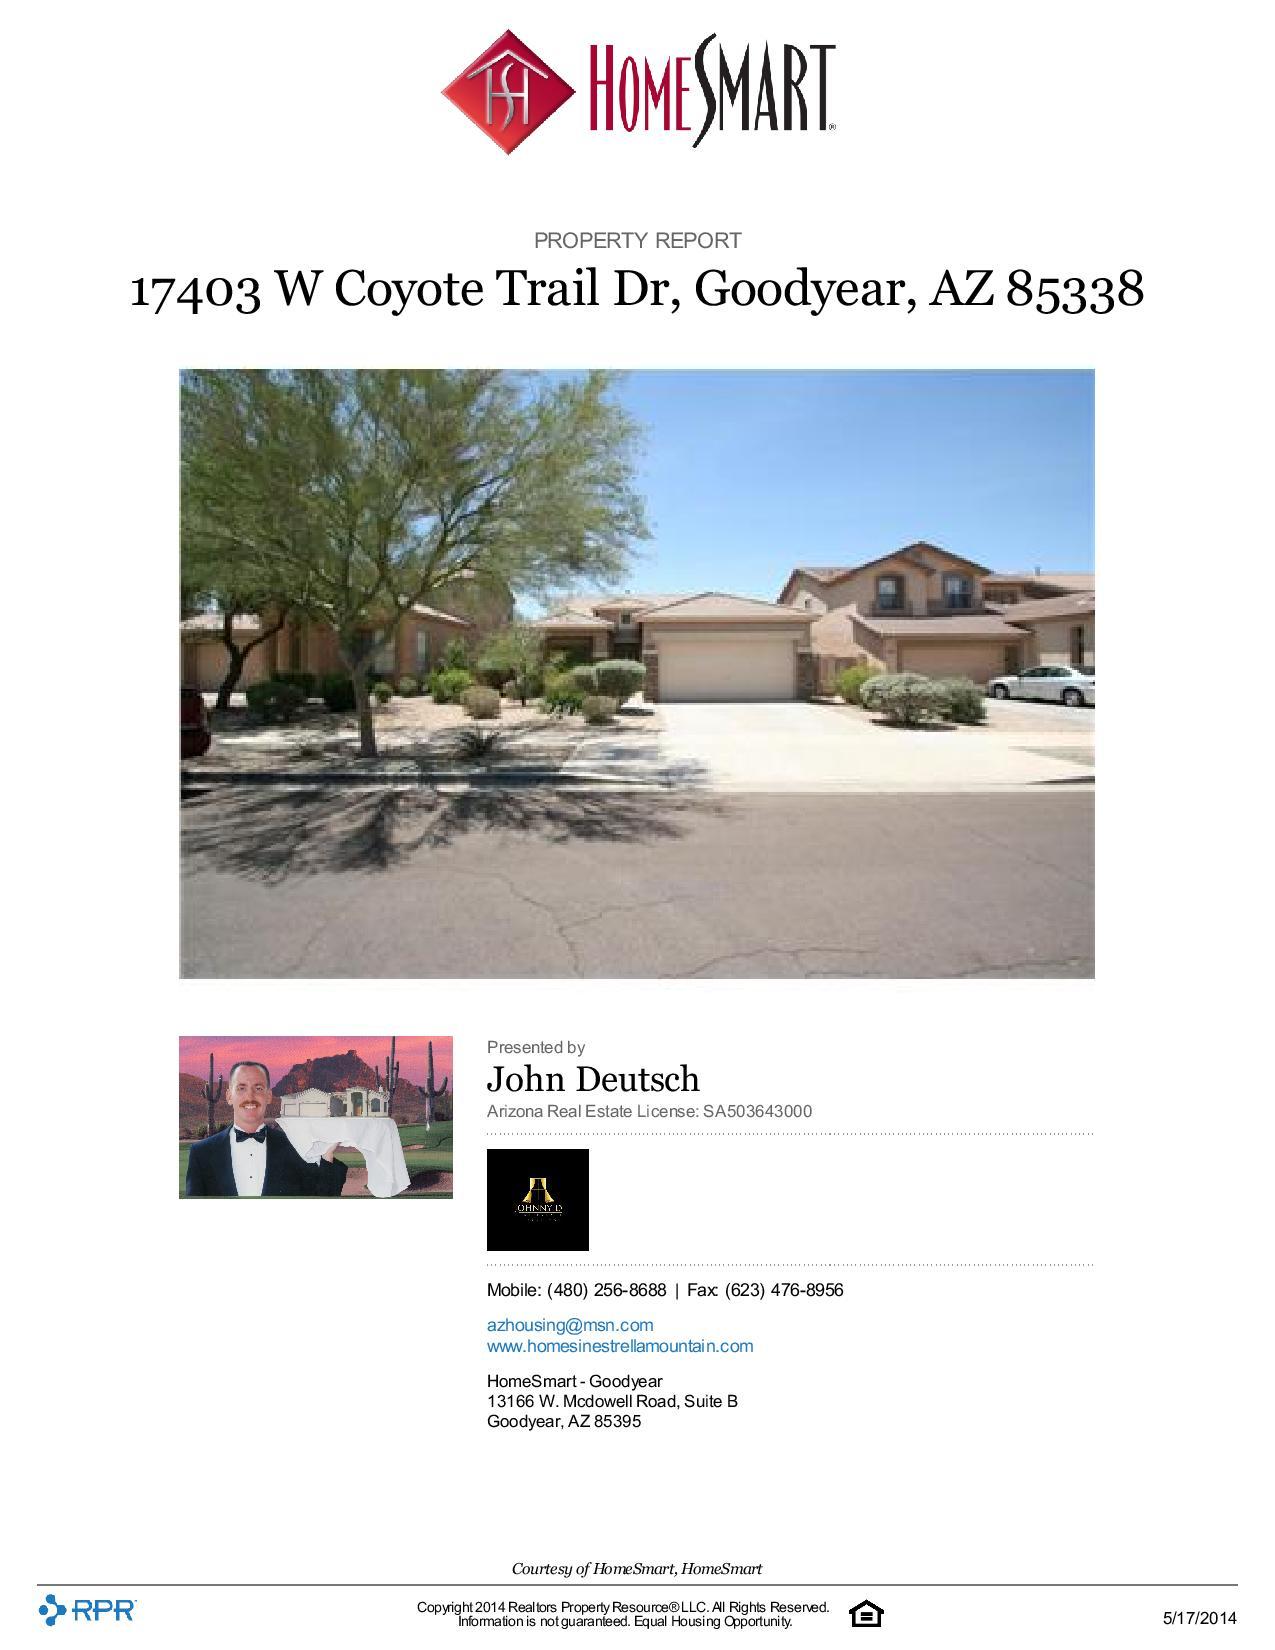 17403-W-Coyote-Trail-Dr-Goodyear-AZ-85338-page-001